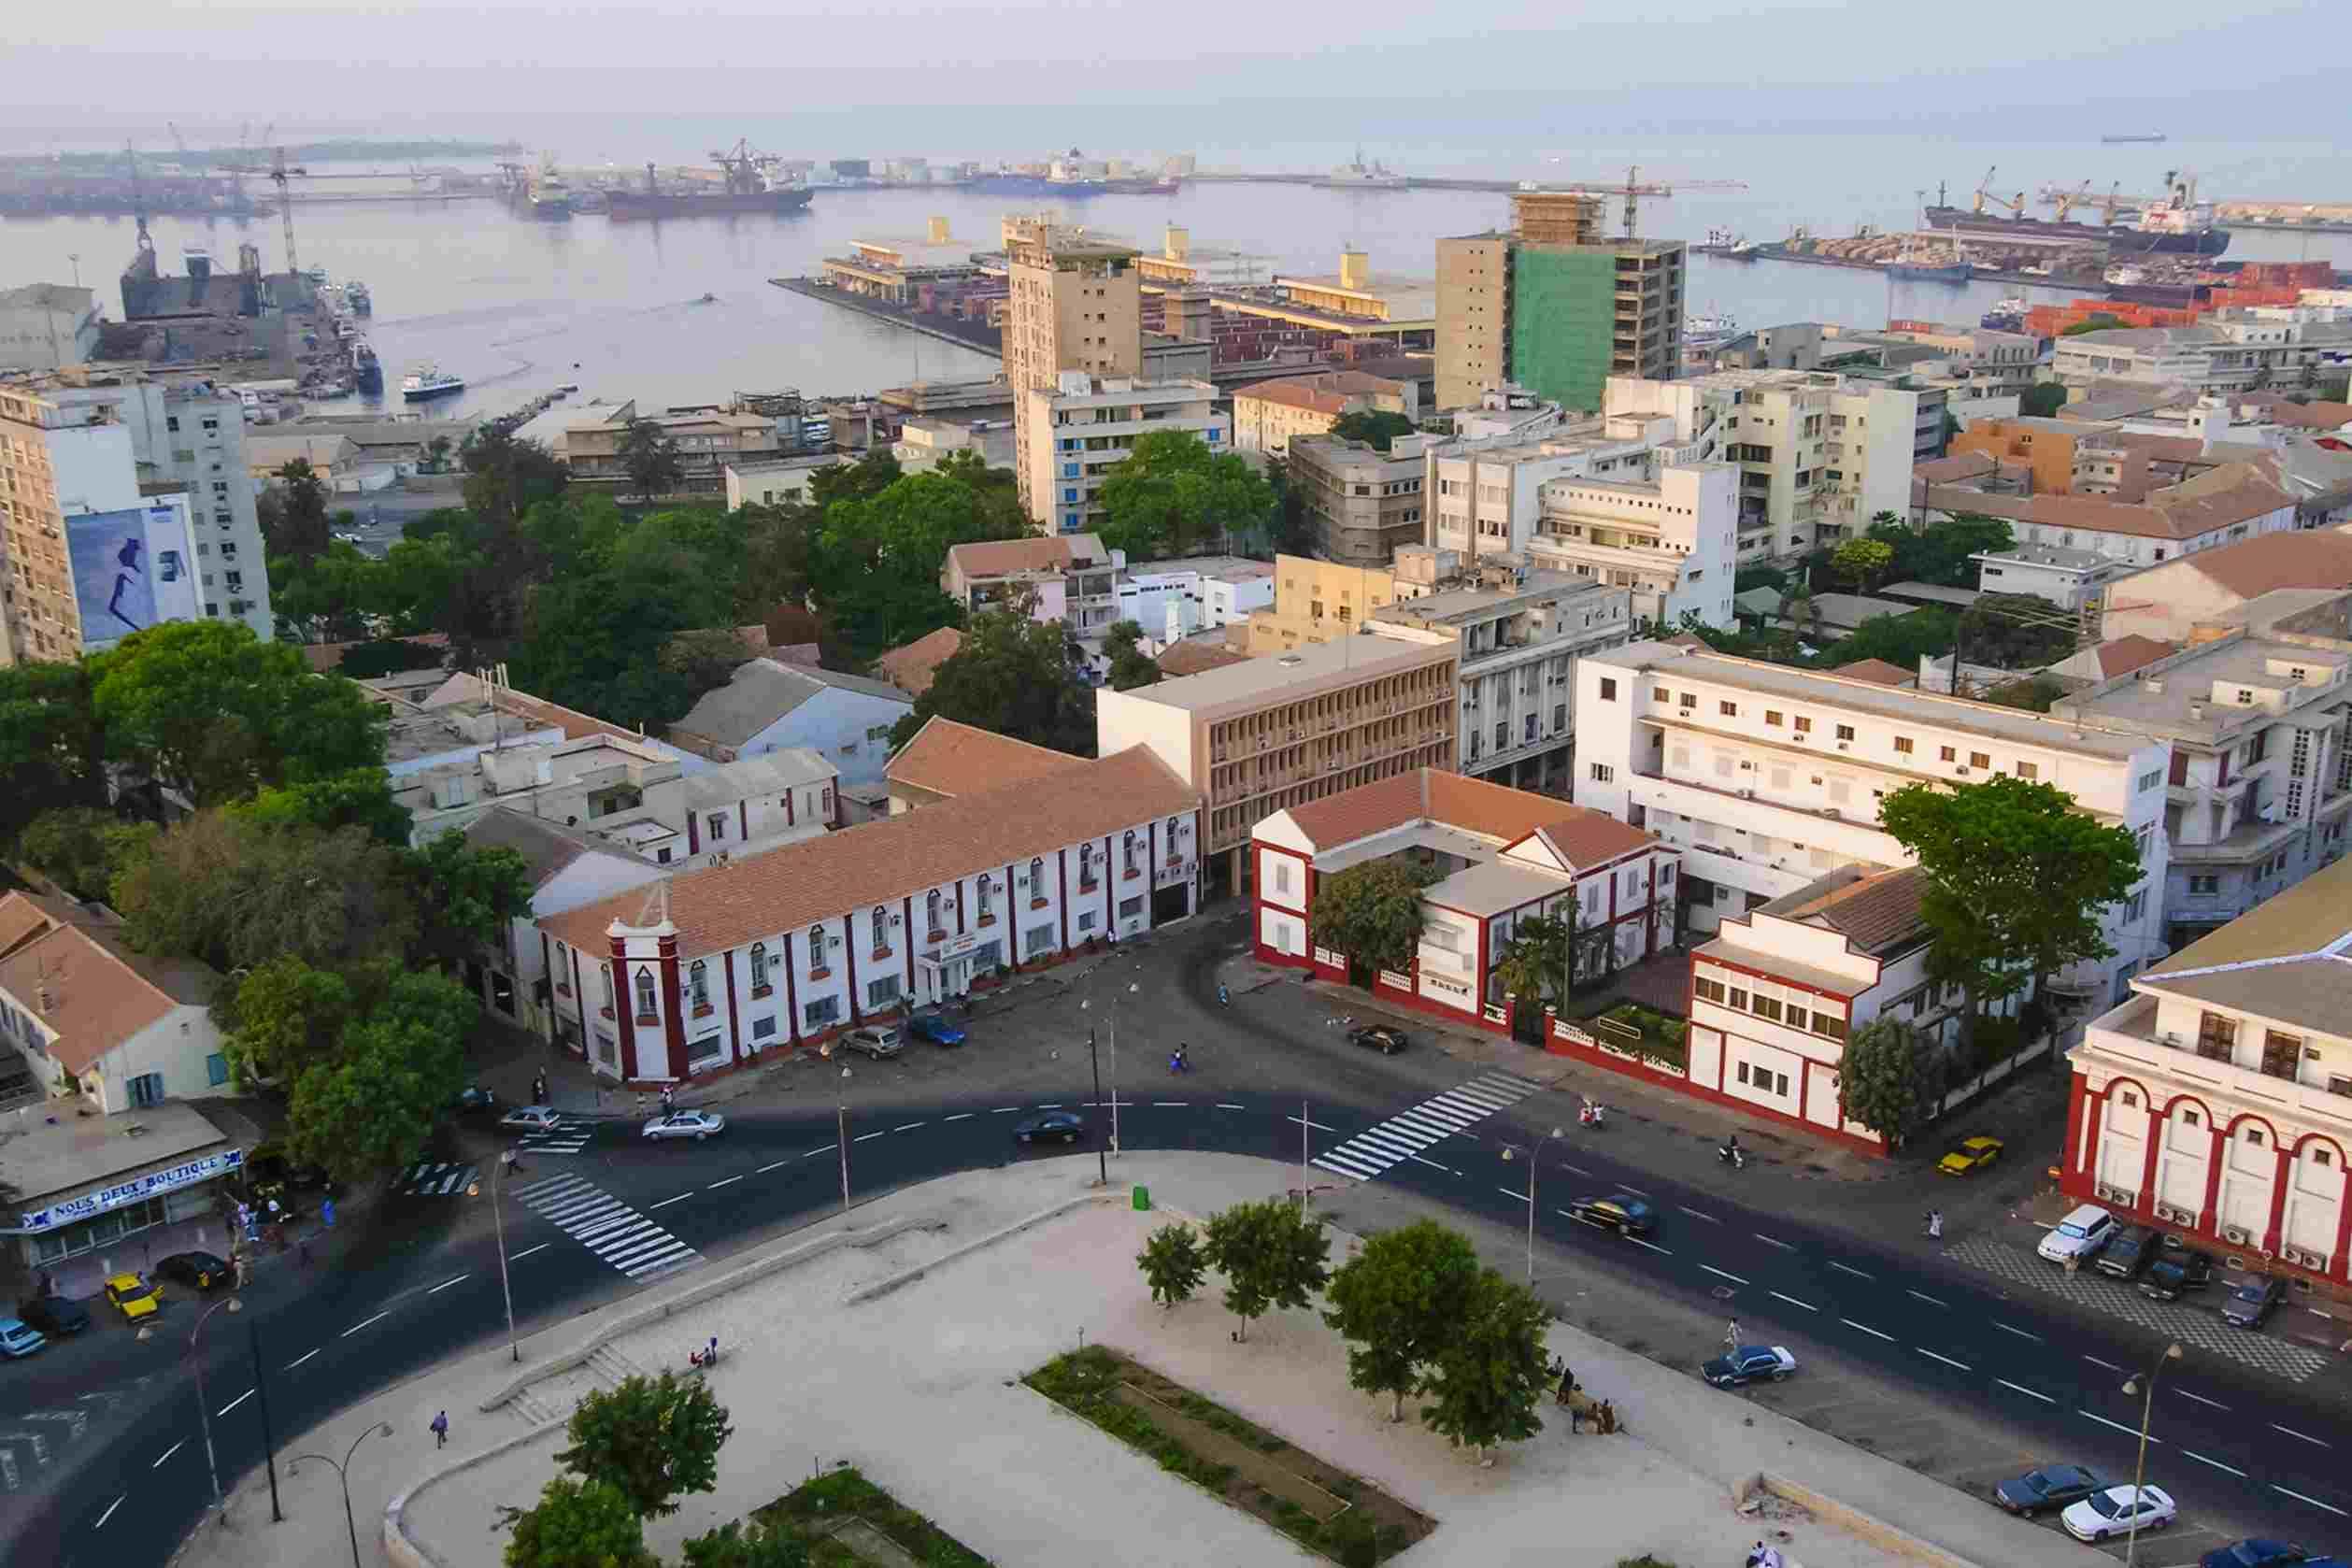 Salah satu sudut kota Dakar, ibukota Senegal   tripsavvy.com